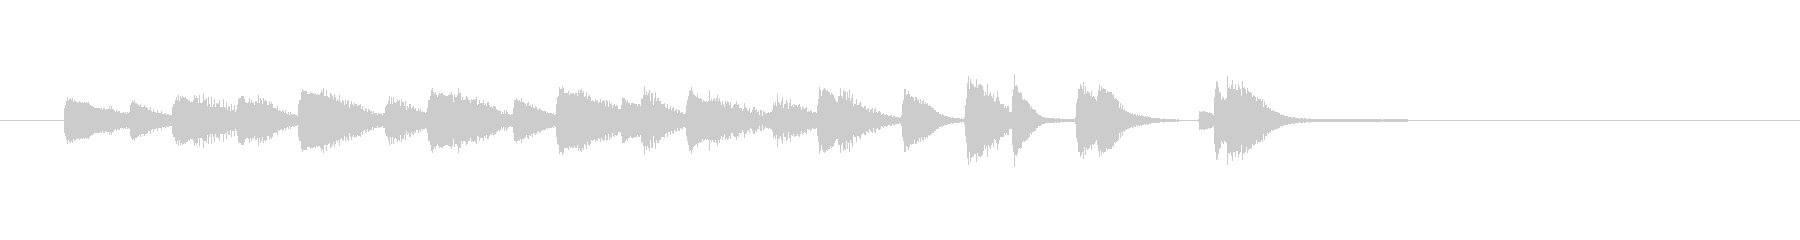 Jazz Piano Jingle 1の未再生の波形